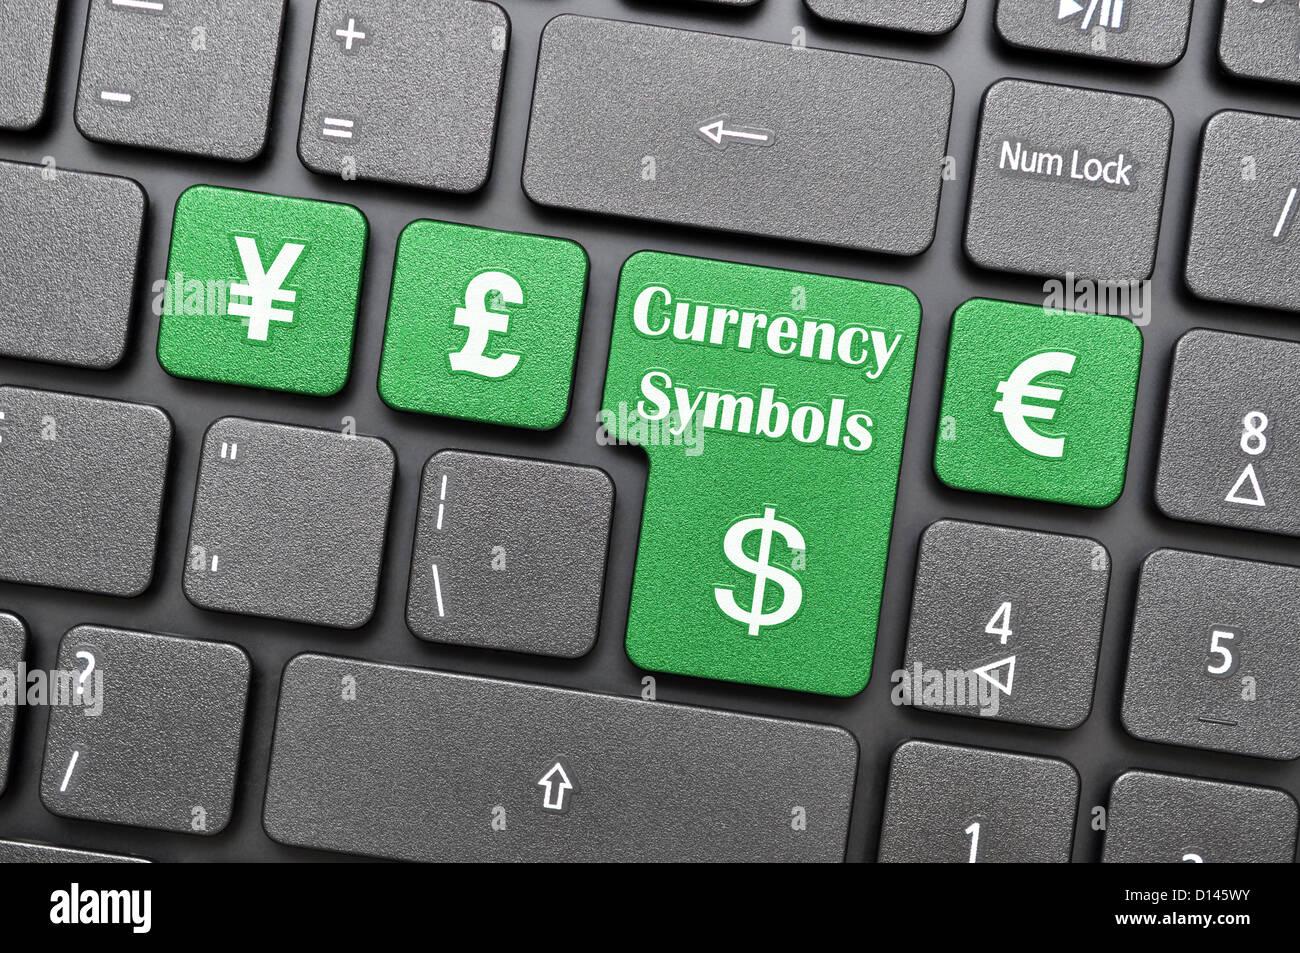 Currency symbols on keyboard Stock Photo: 52338215 - Alamy